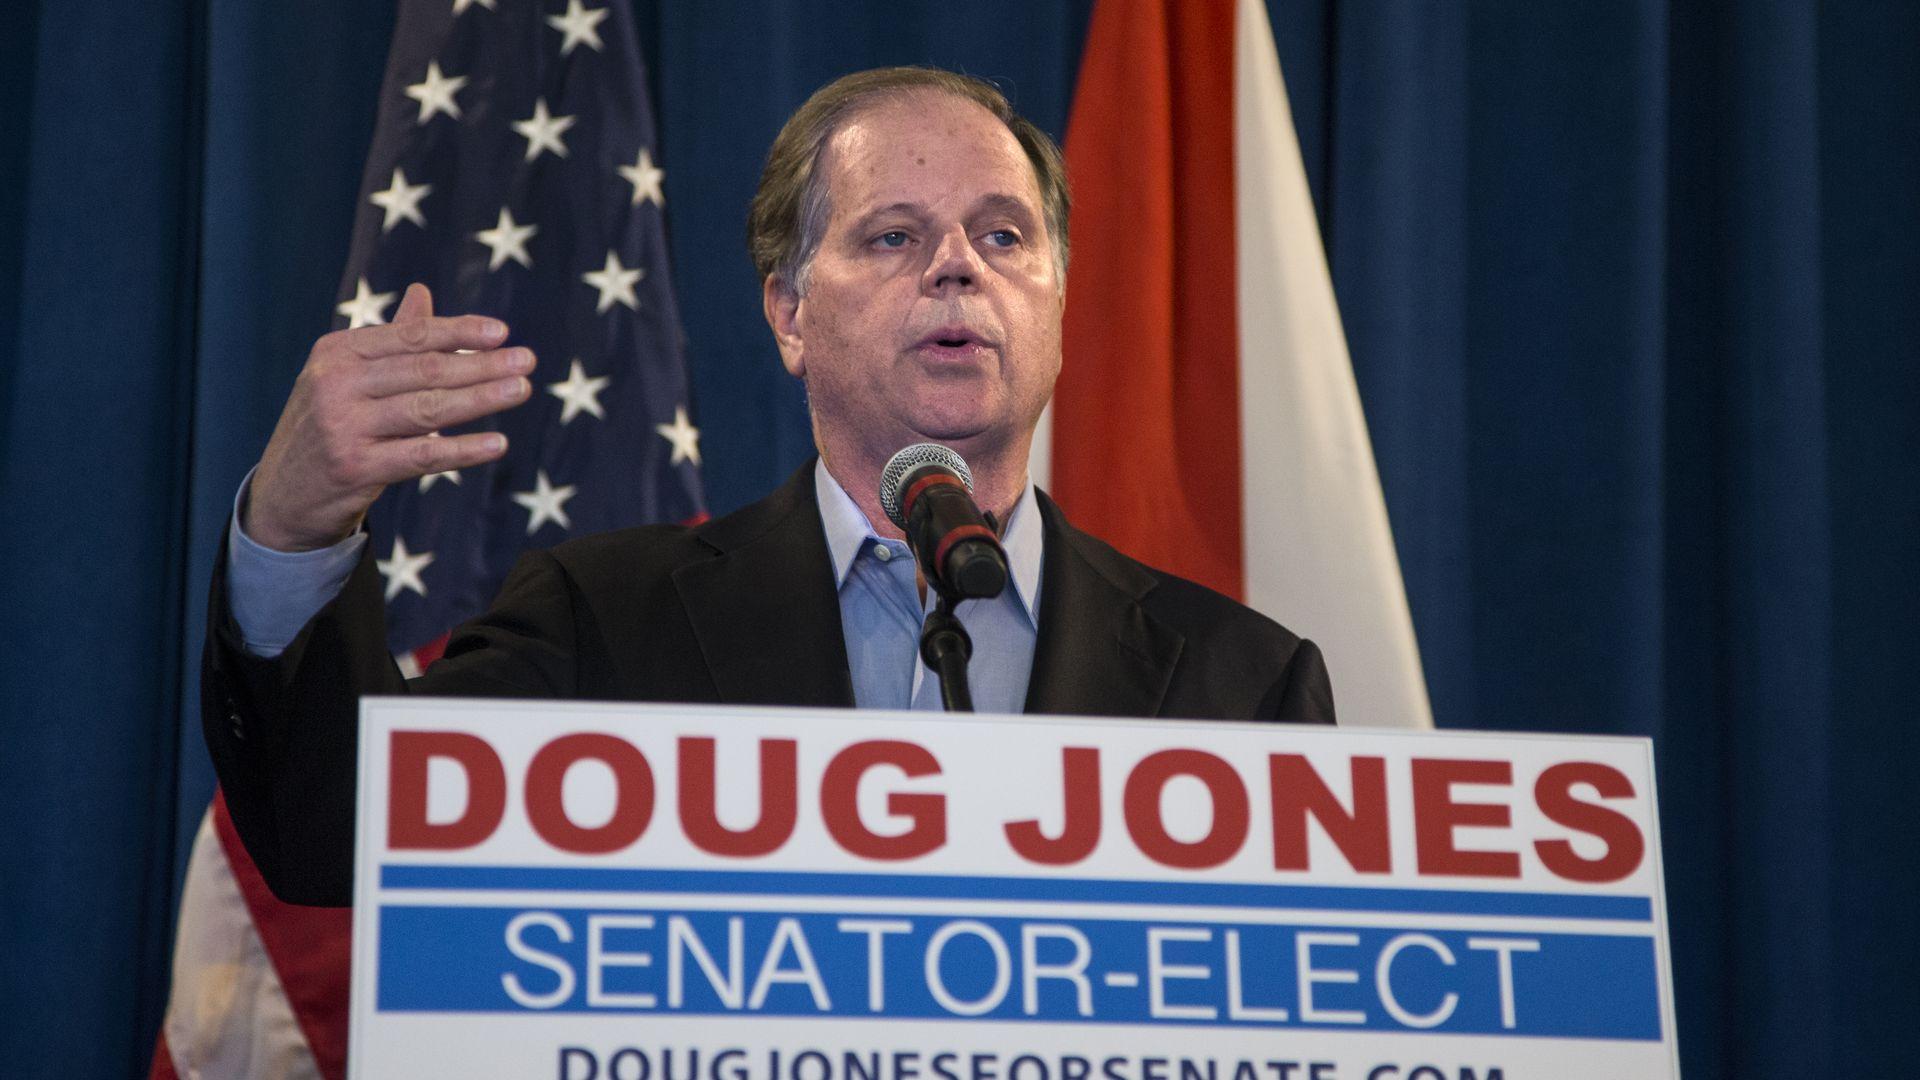 Doug Jones (D-AL). Photo: Mark Wallheiser/Getty Images